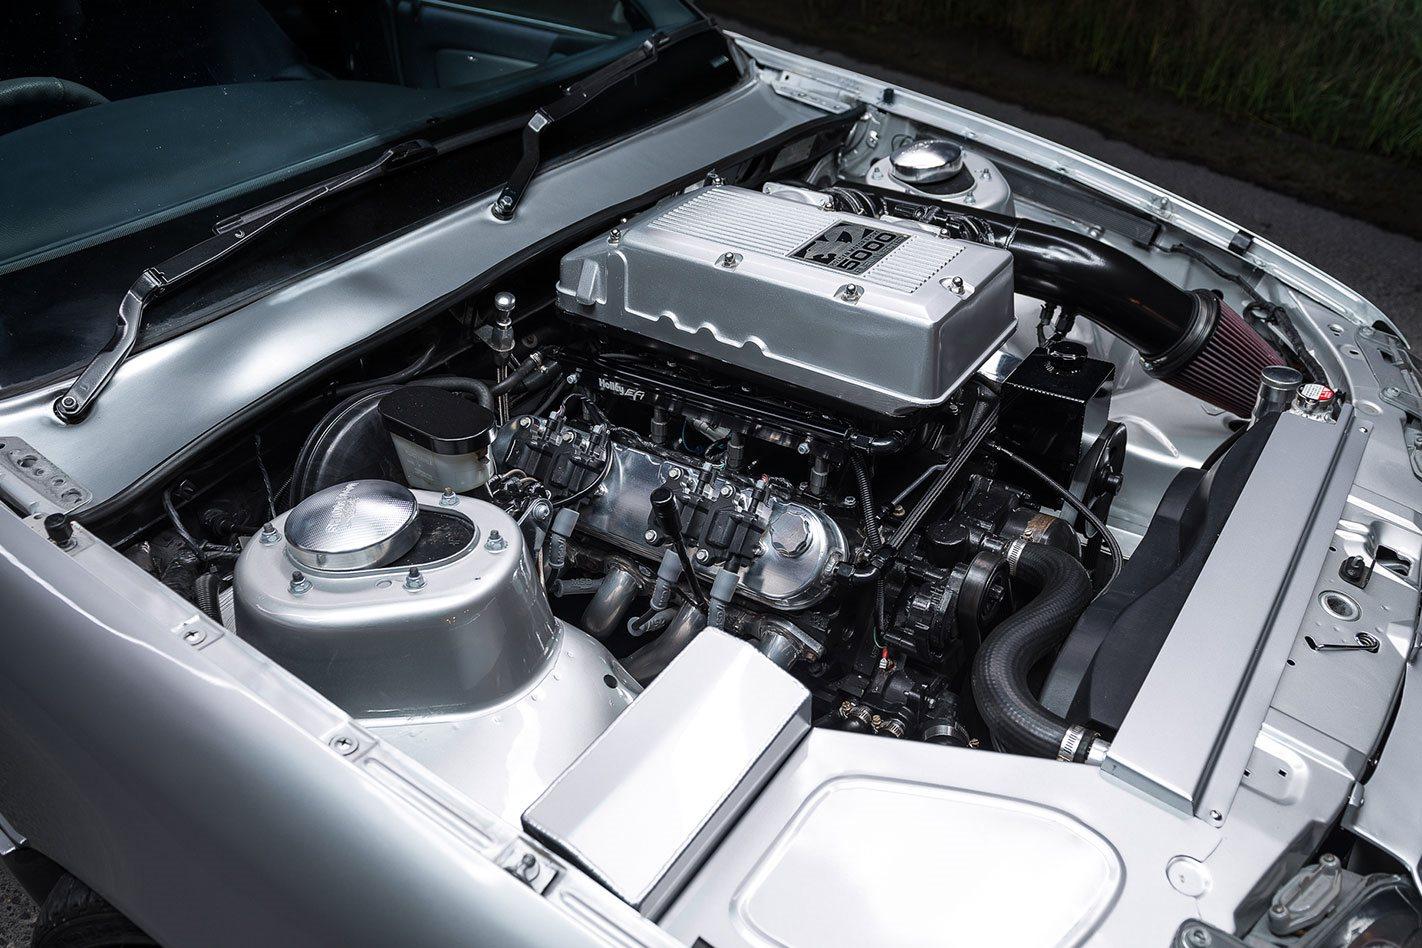 Naturally Aspirated Engine Vs Turbo